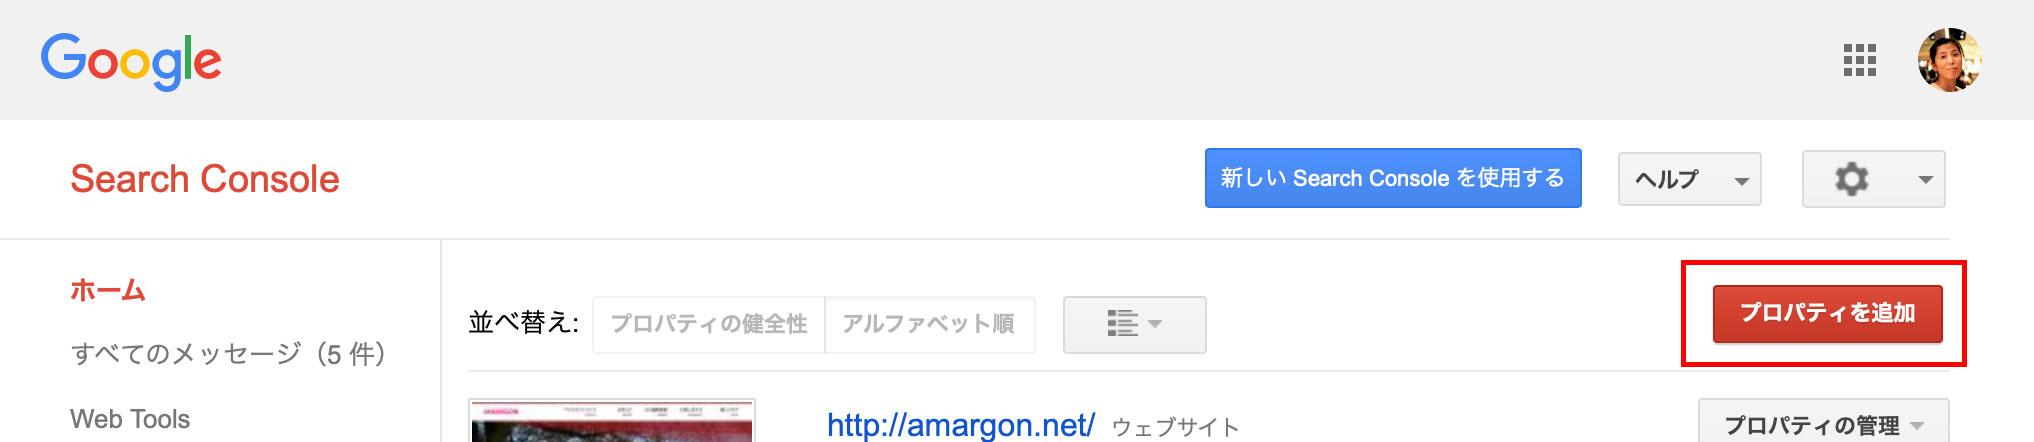 Googleサーチコンソールのプロパティ追加